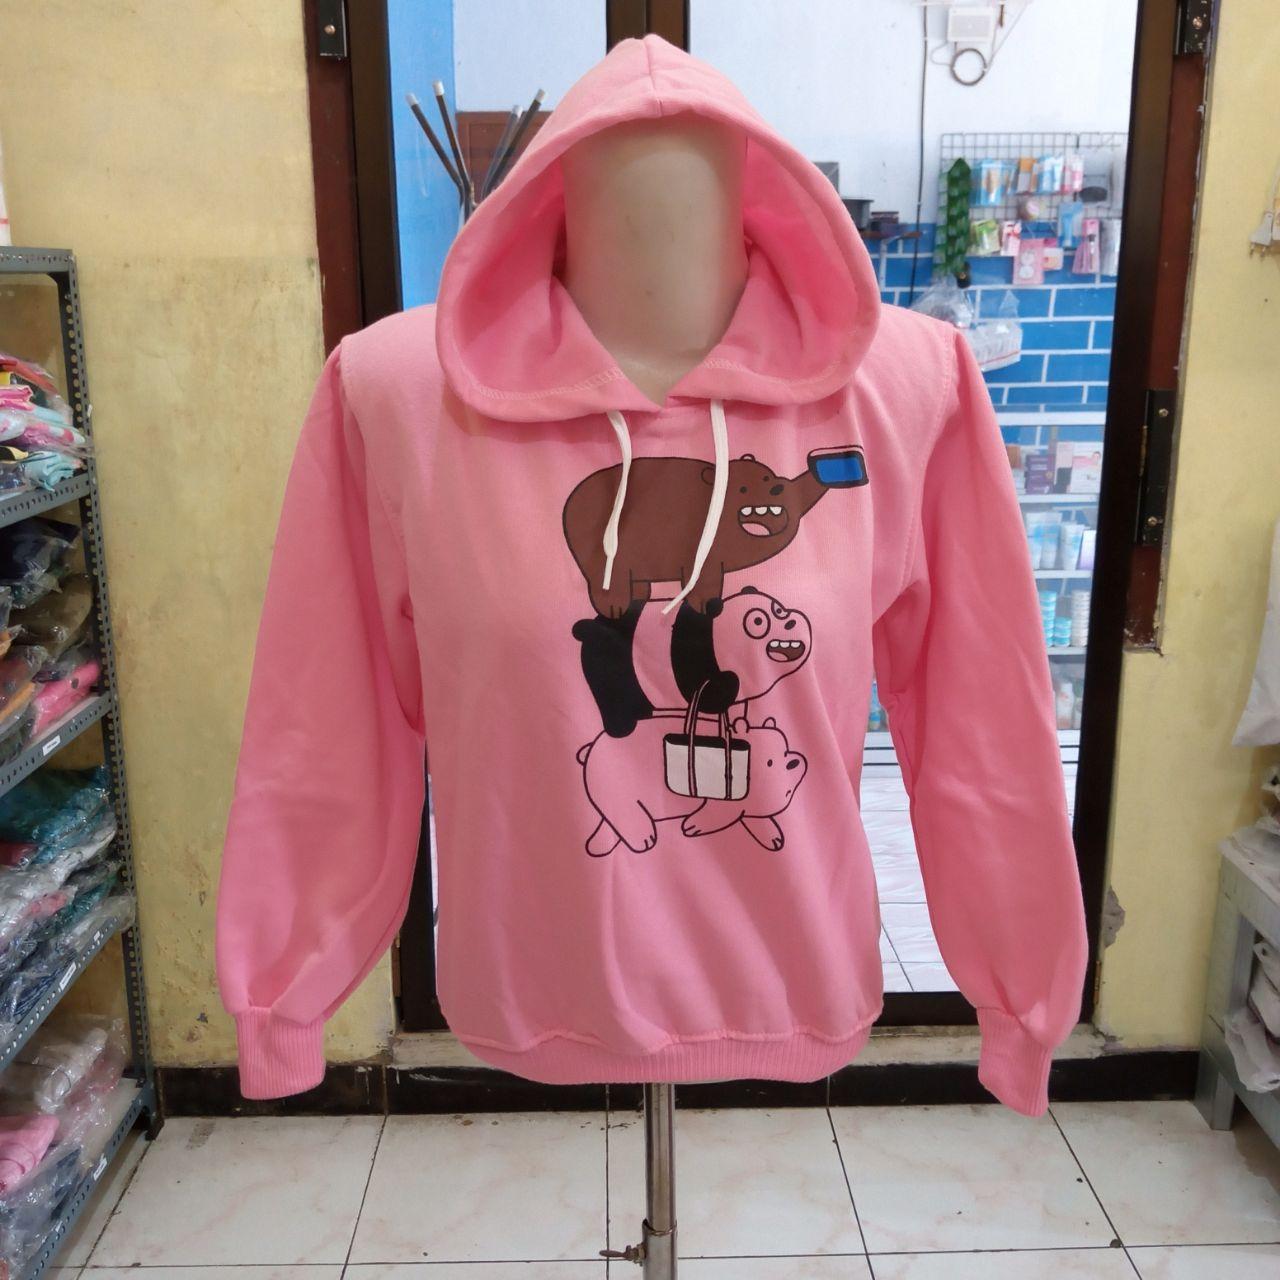 ini adalah Jaket Anak 3 Bear Pink, size: LD +- 78cm, material: Fleece, color: Pink, brand: Jaket Anak Indonesia, age_group: kids, gender: unisex